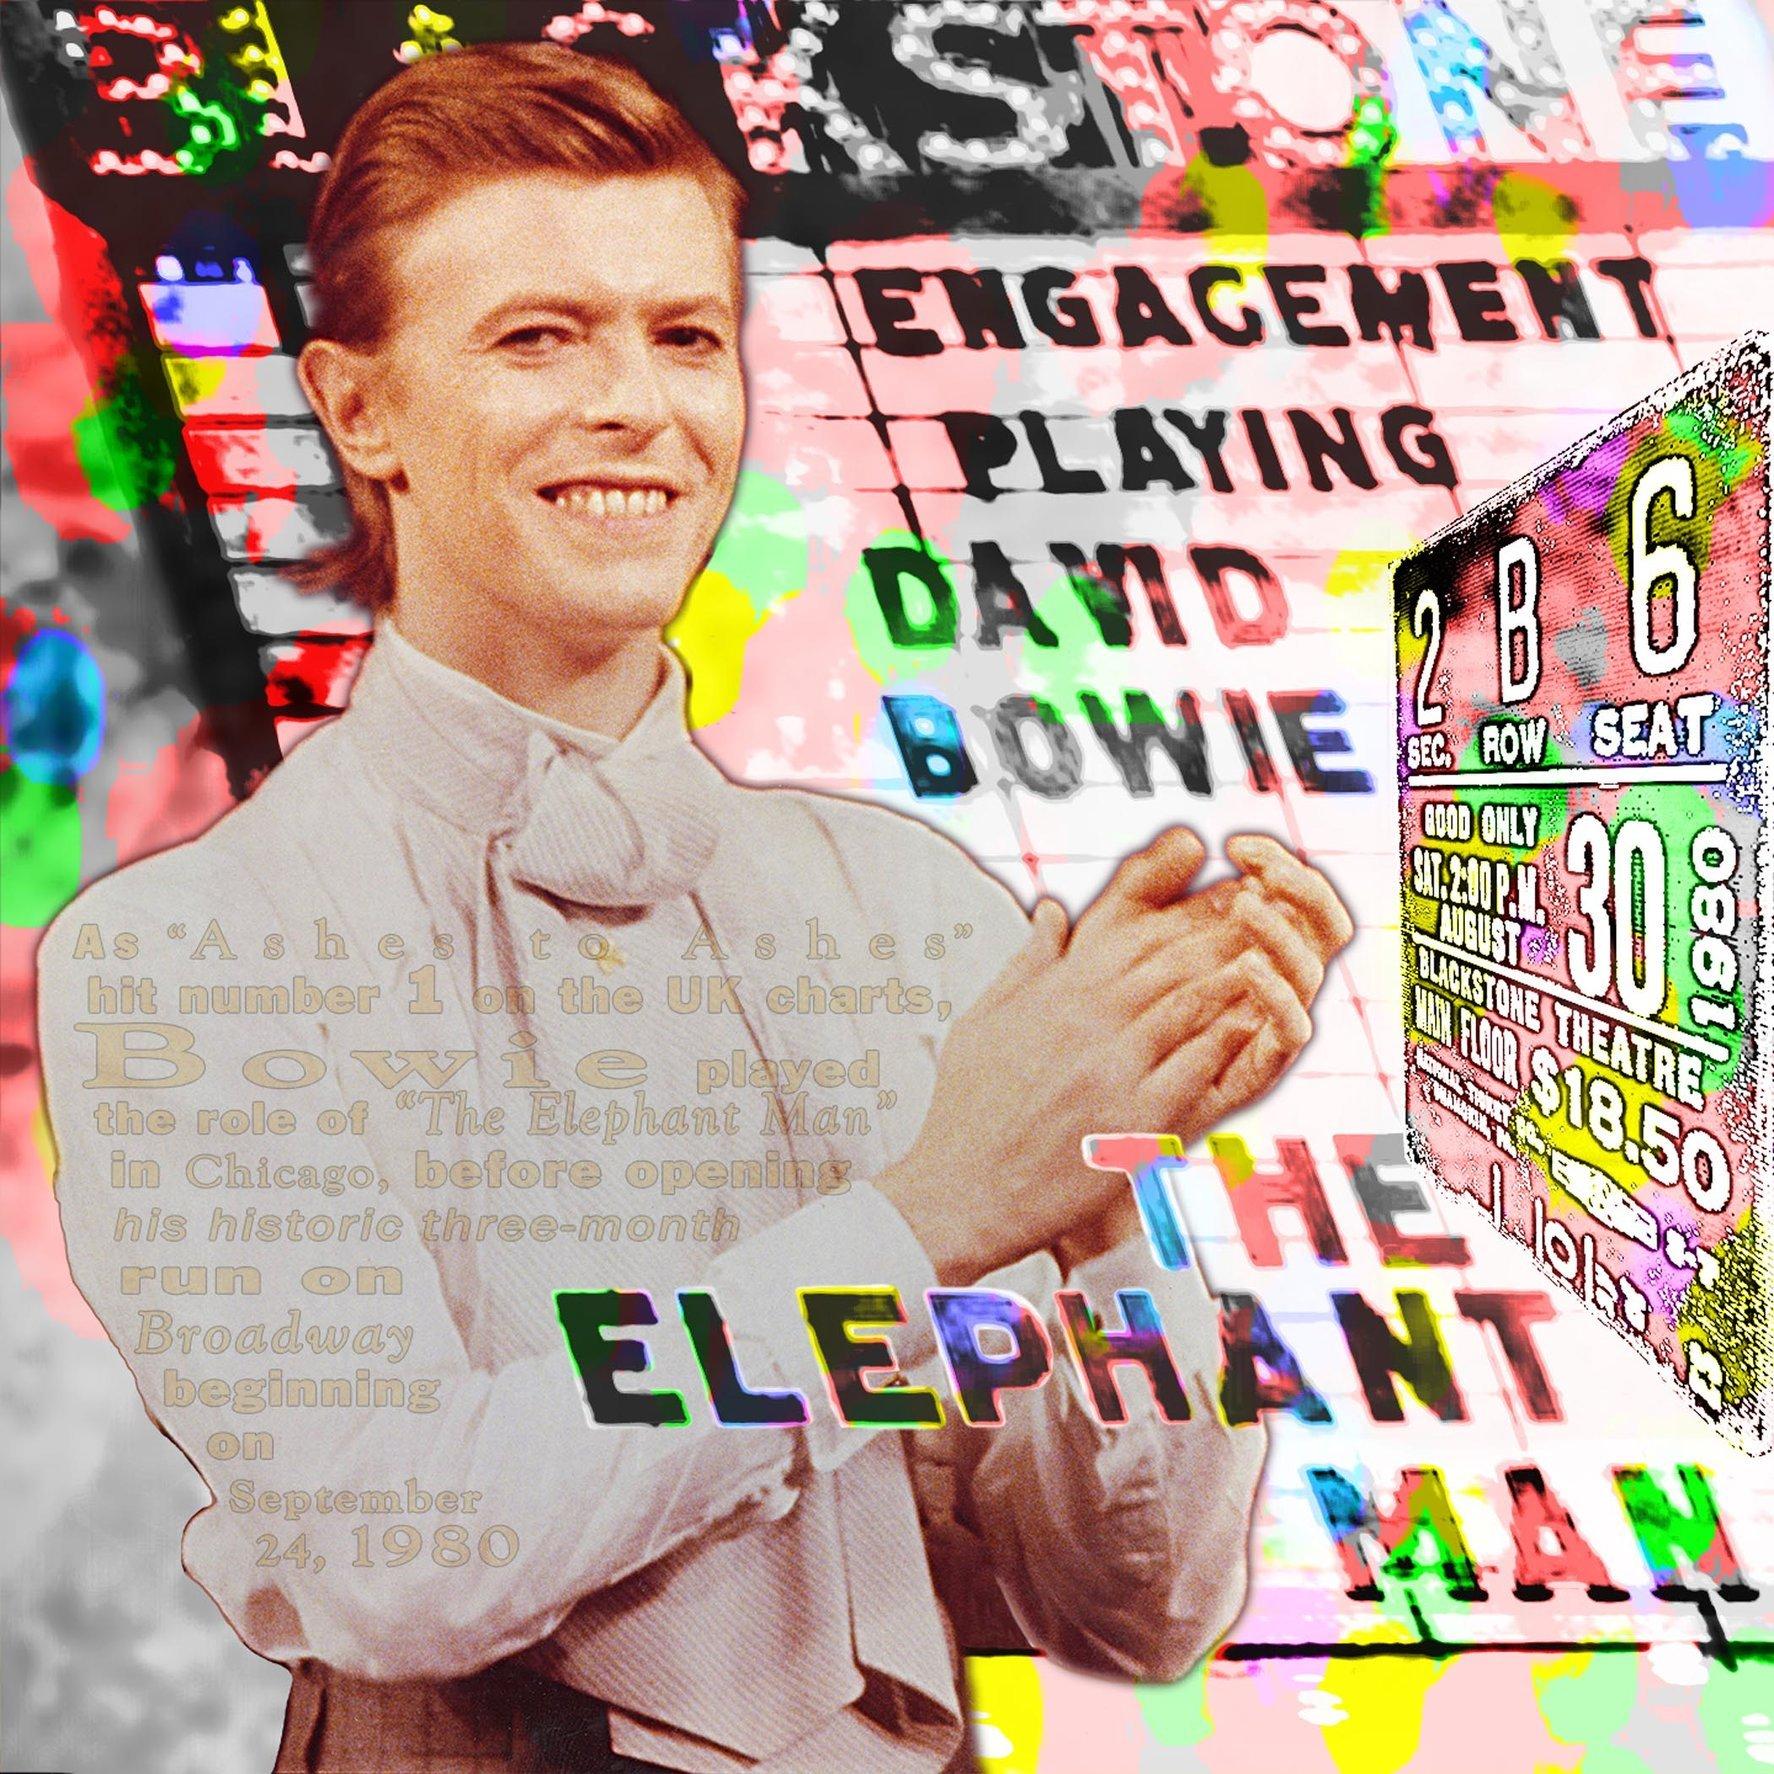 Bowie20 x20a.jpg